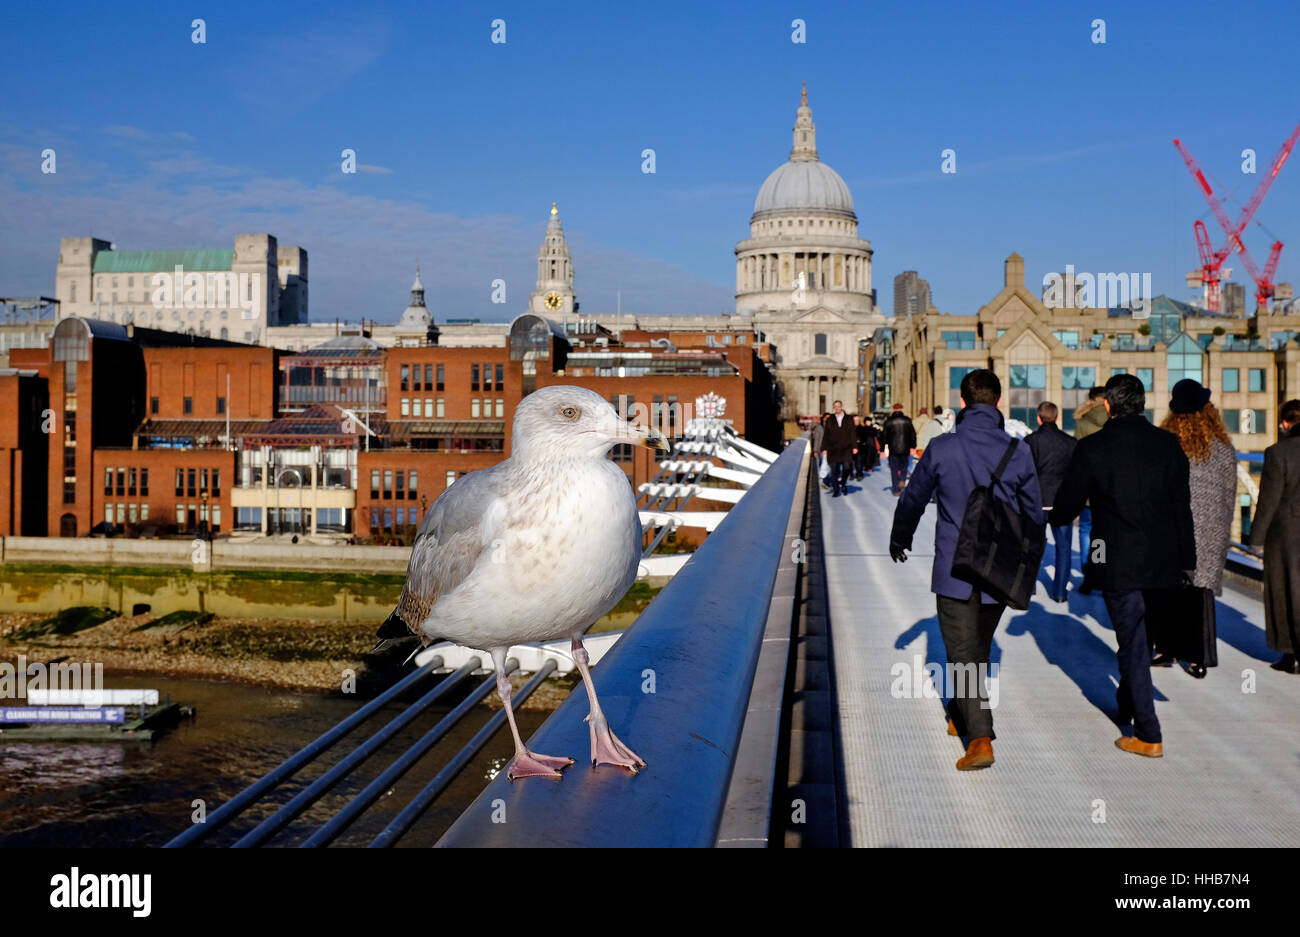 gull sitting on handrail, millennium bridge, london, england - Stock Image